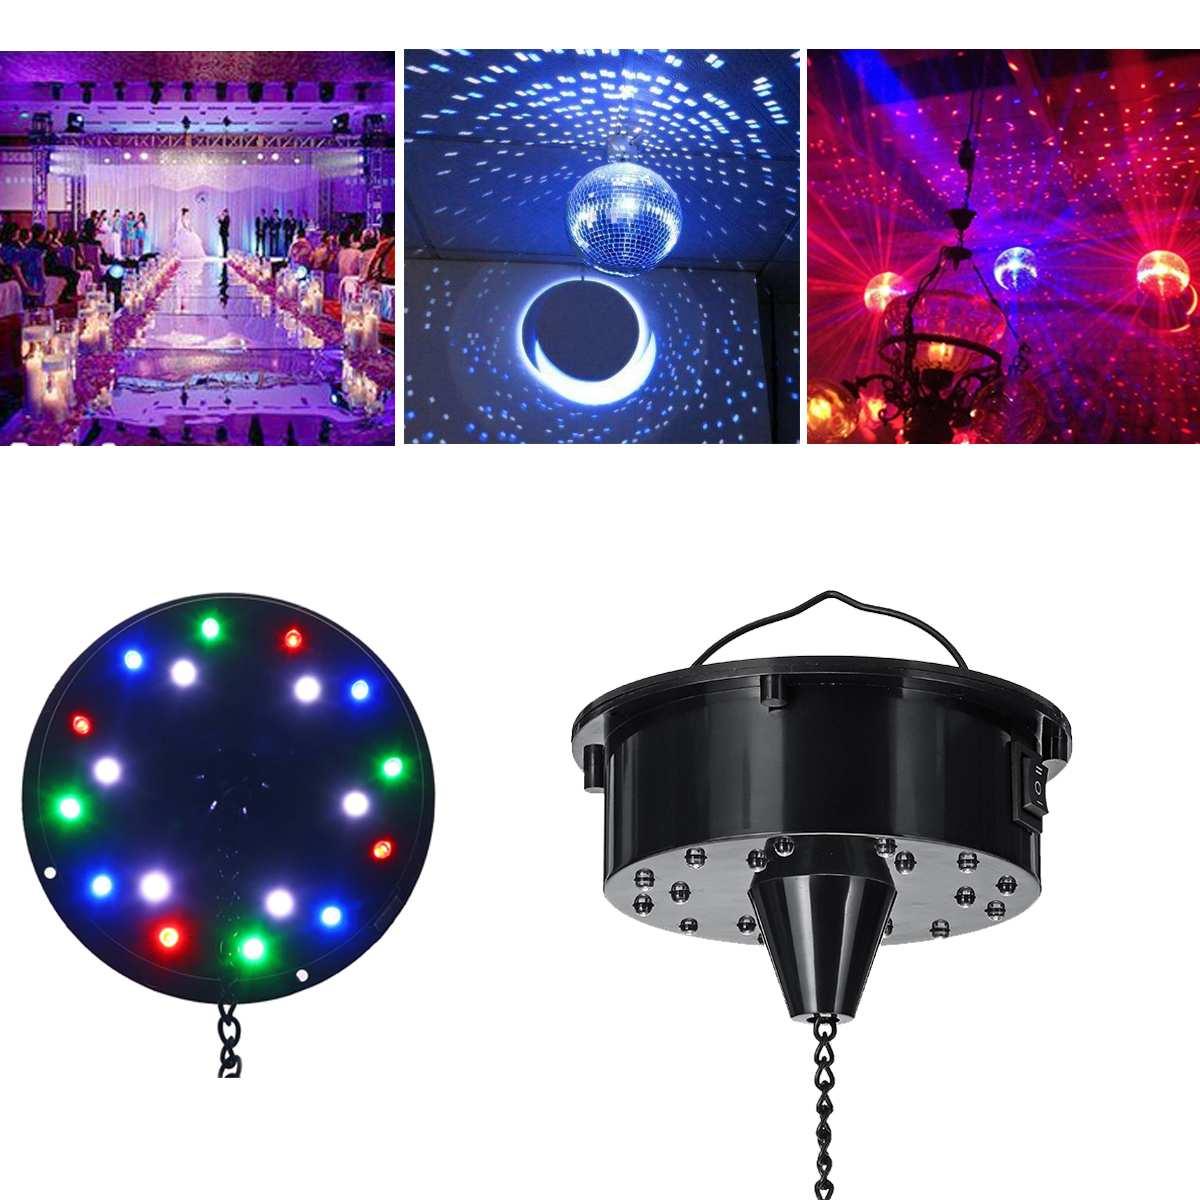 18 luzes led vidro rotativo espelho bola